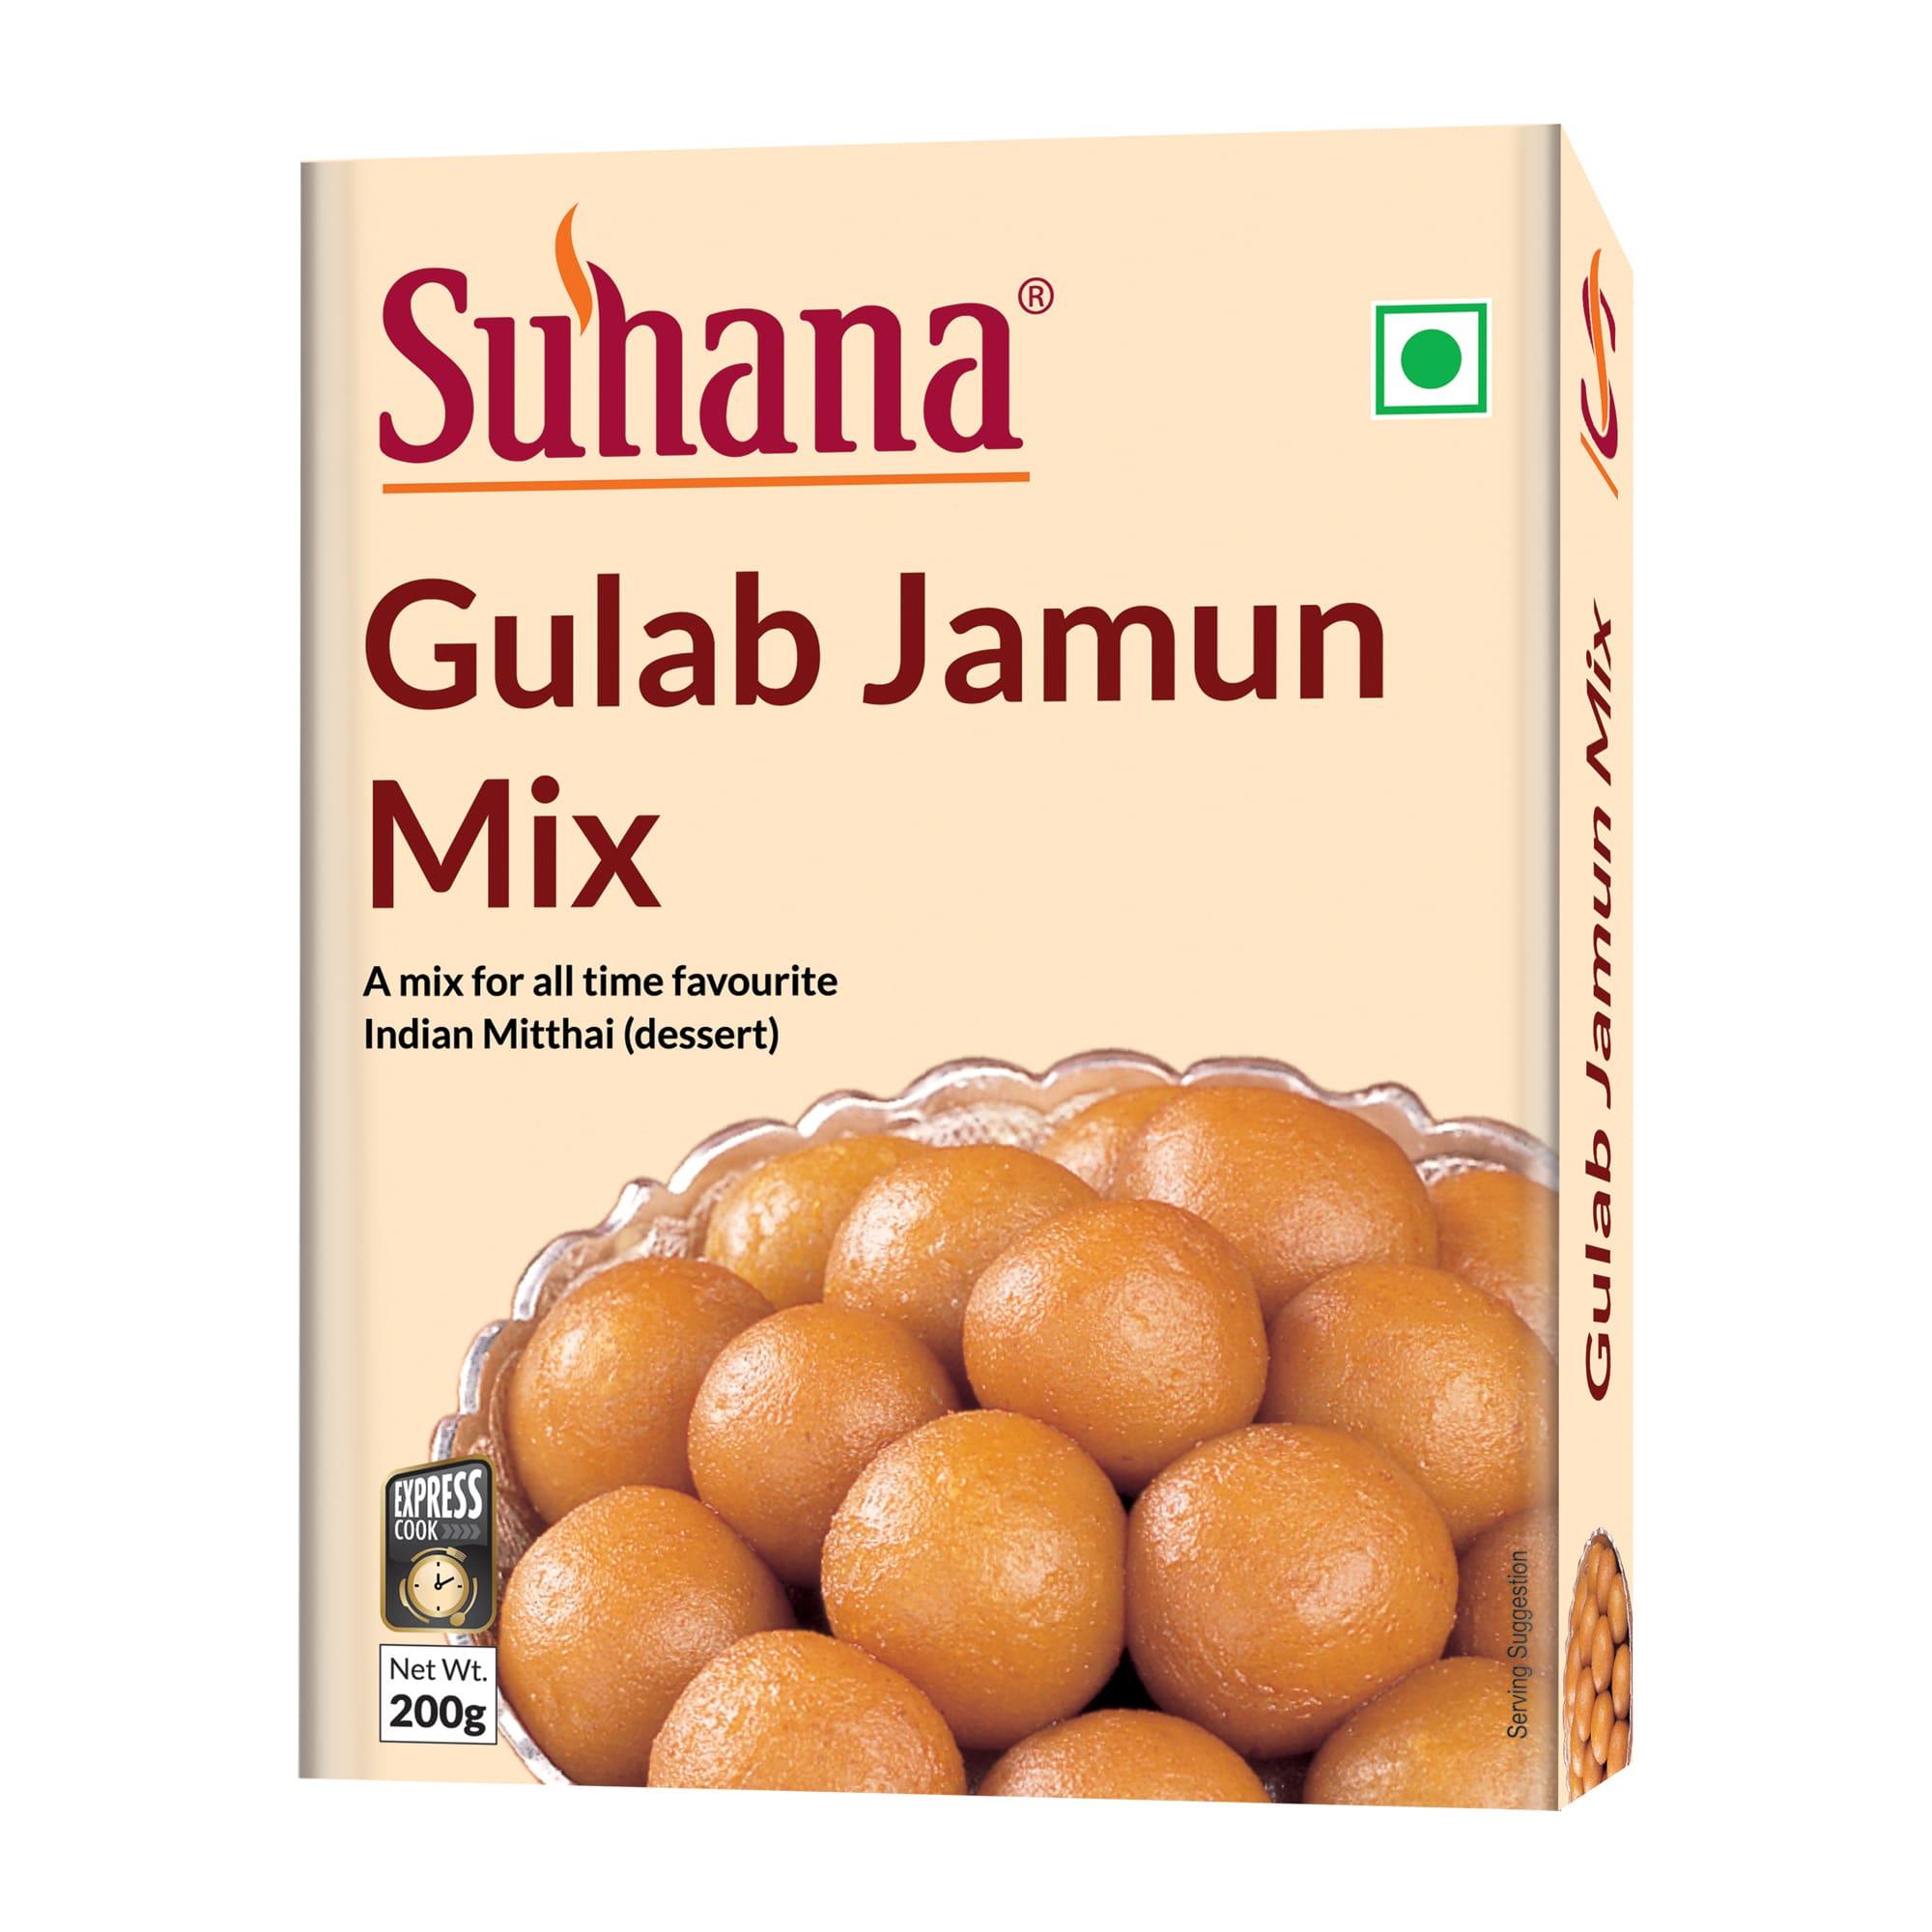 Suhana Gulab Jamun Mix 150g Box